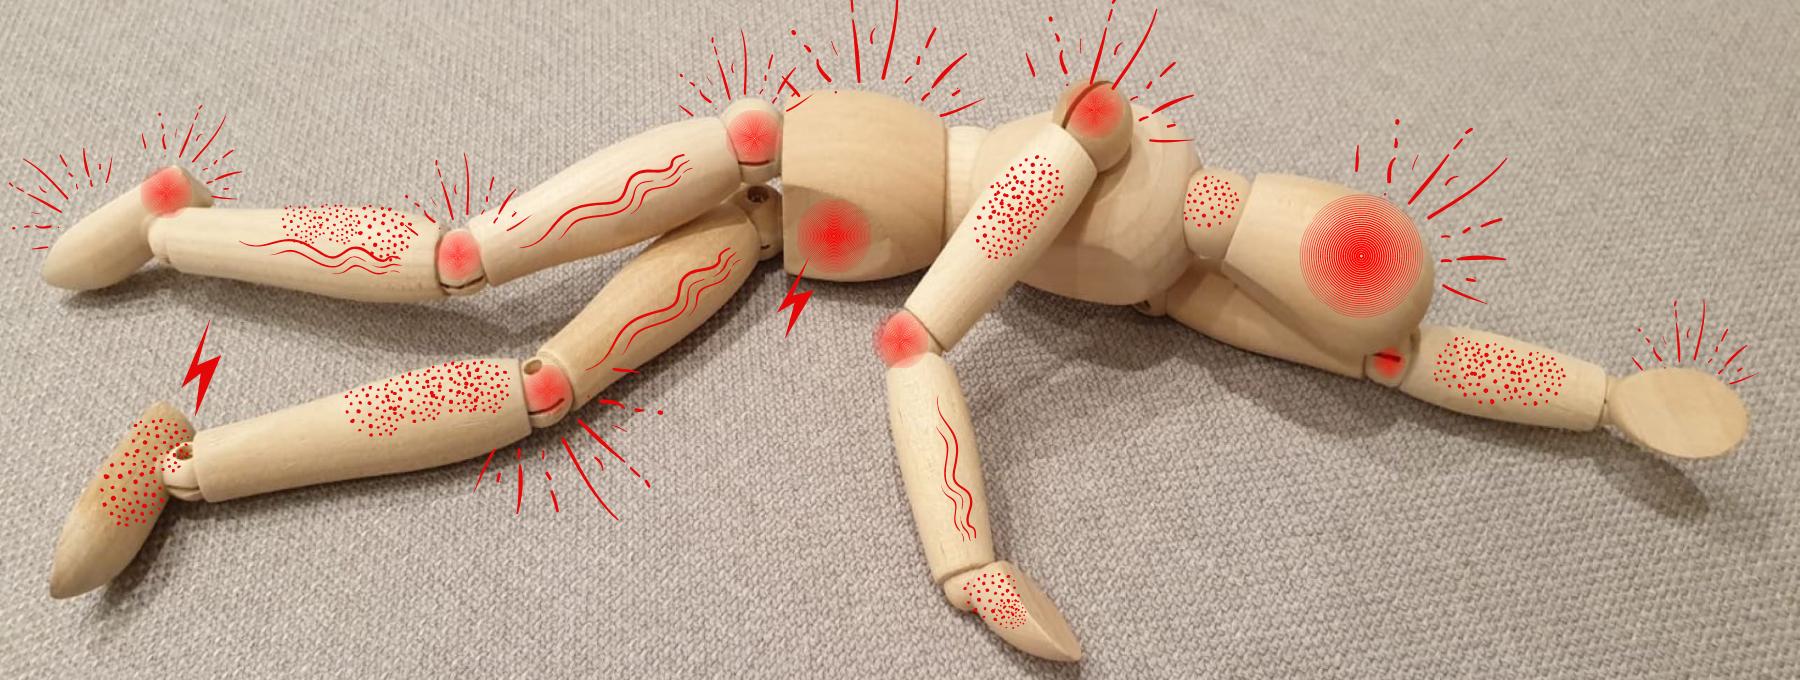 P/C+ Symptom Pain 1800 x 680